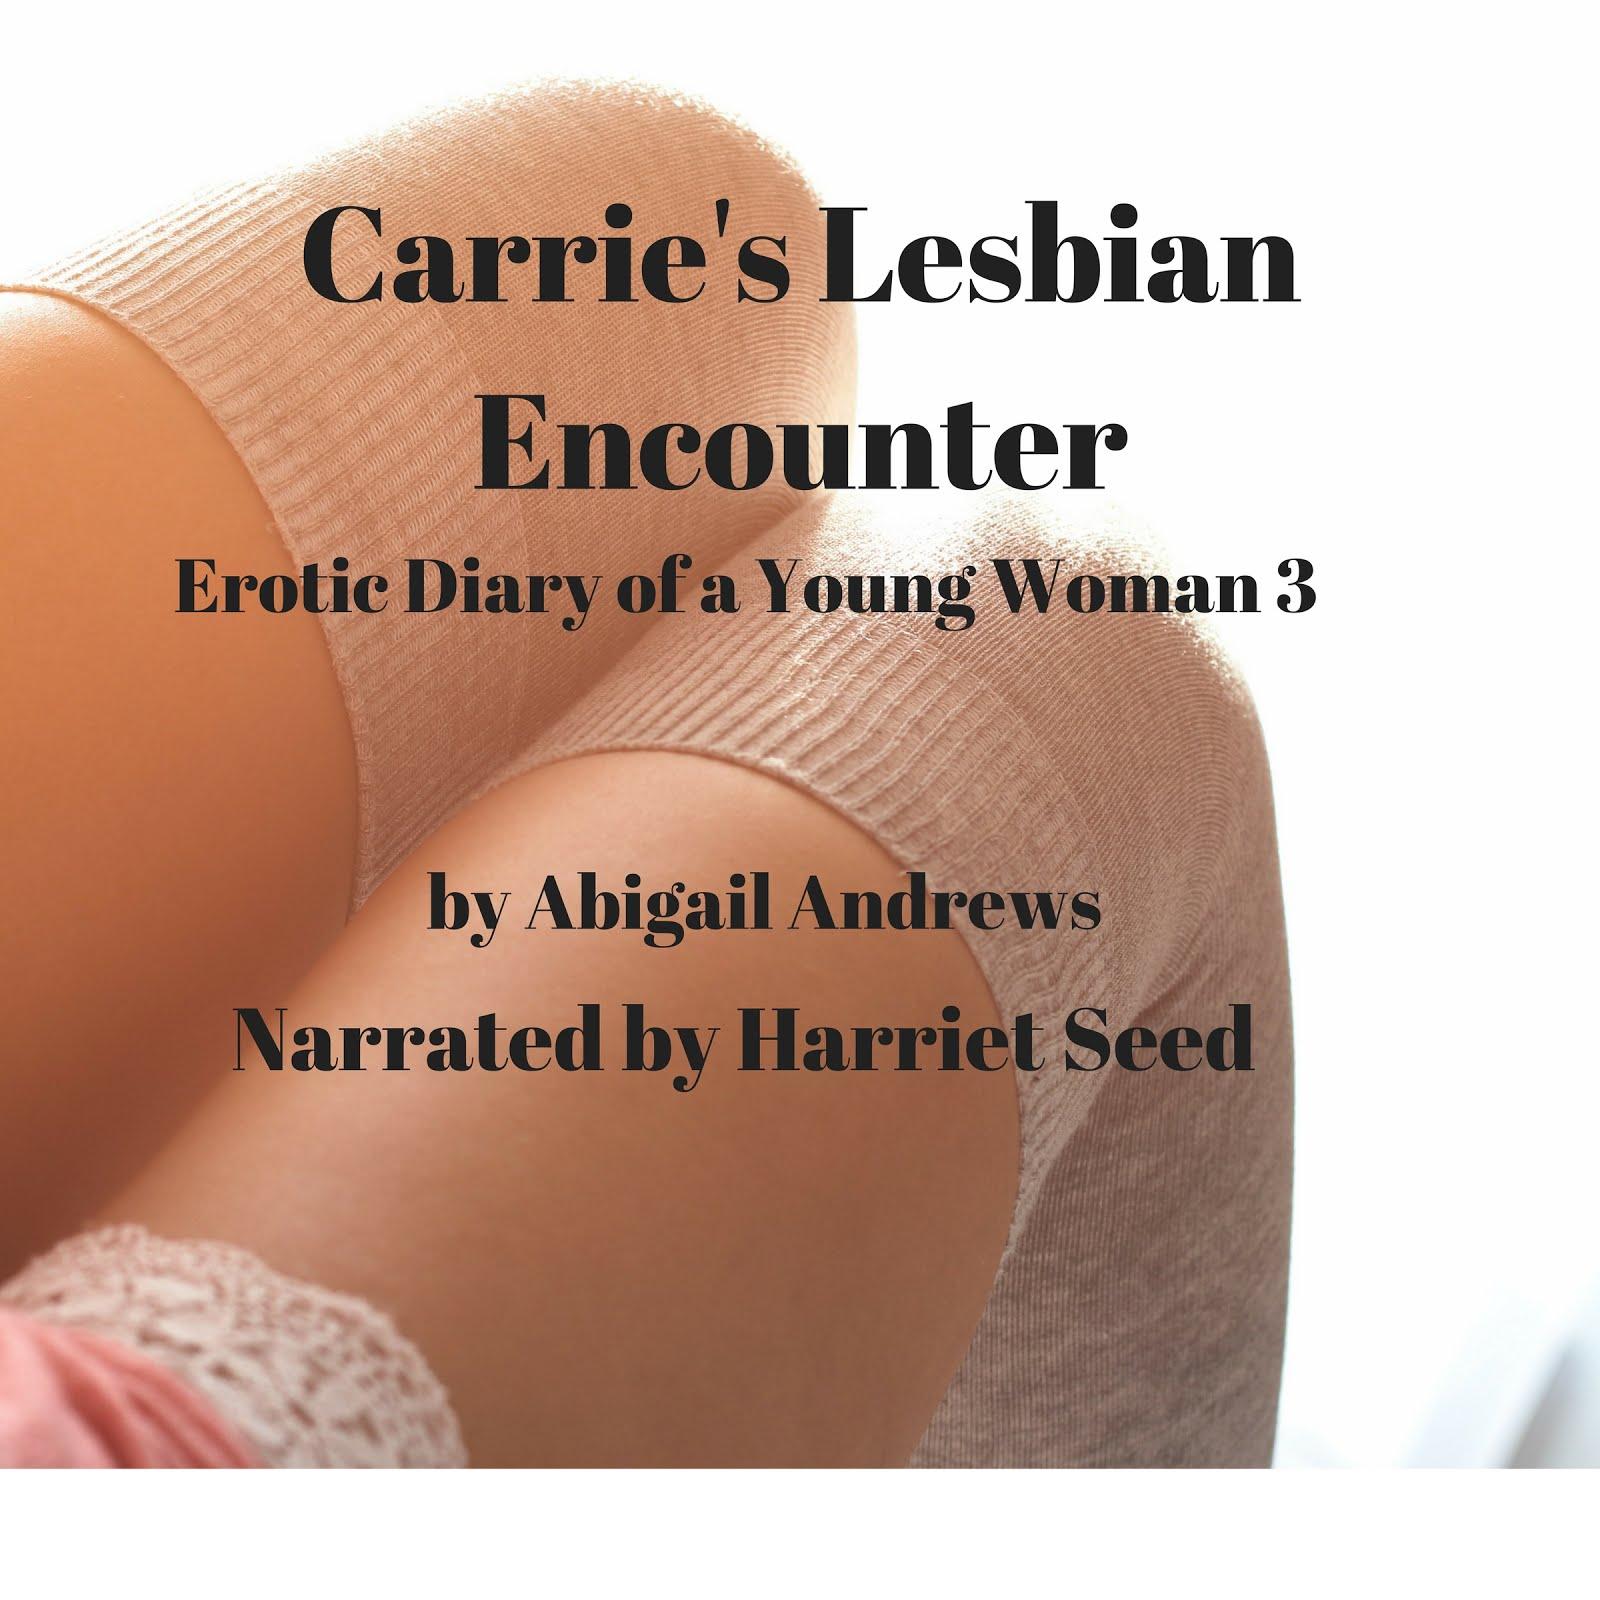 Carrie's Lesbian Encounter